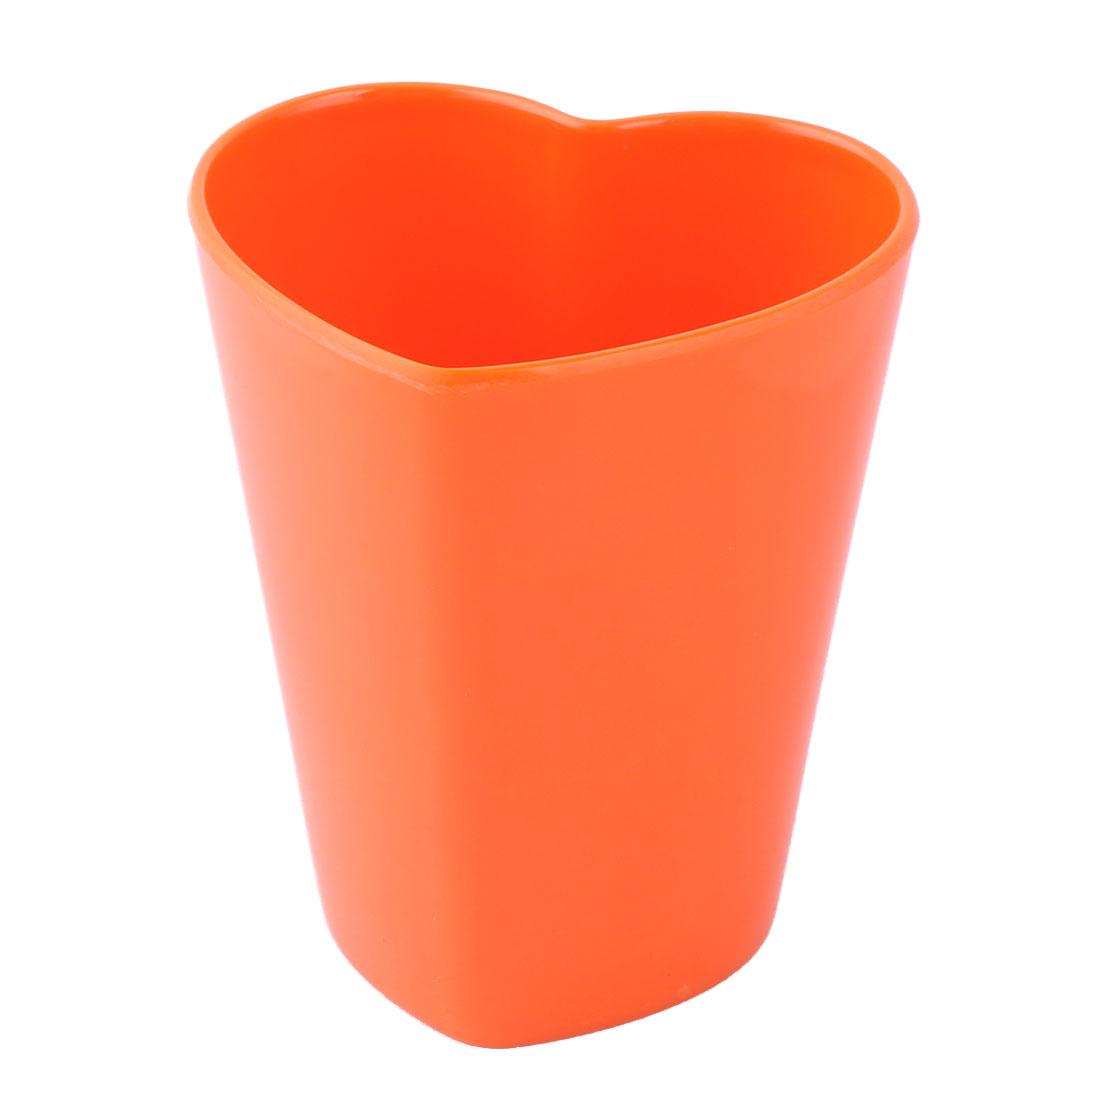 Dining Room Melamine Heart Shaped Coffee Milk Juice Drinking Cup Mug Orange 300ml